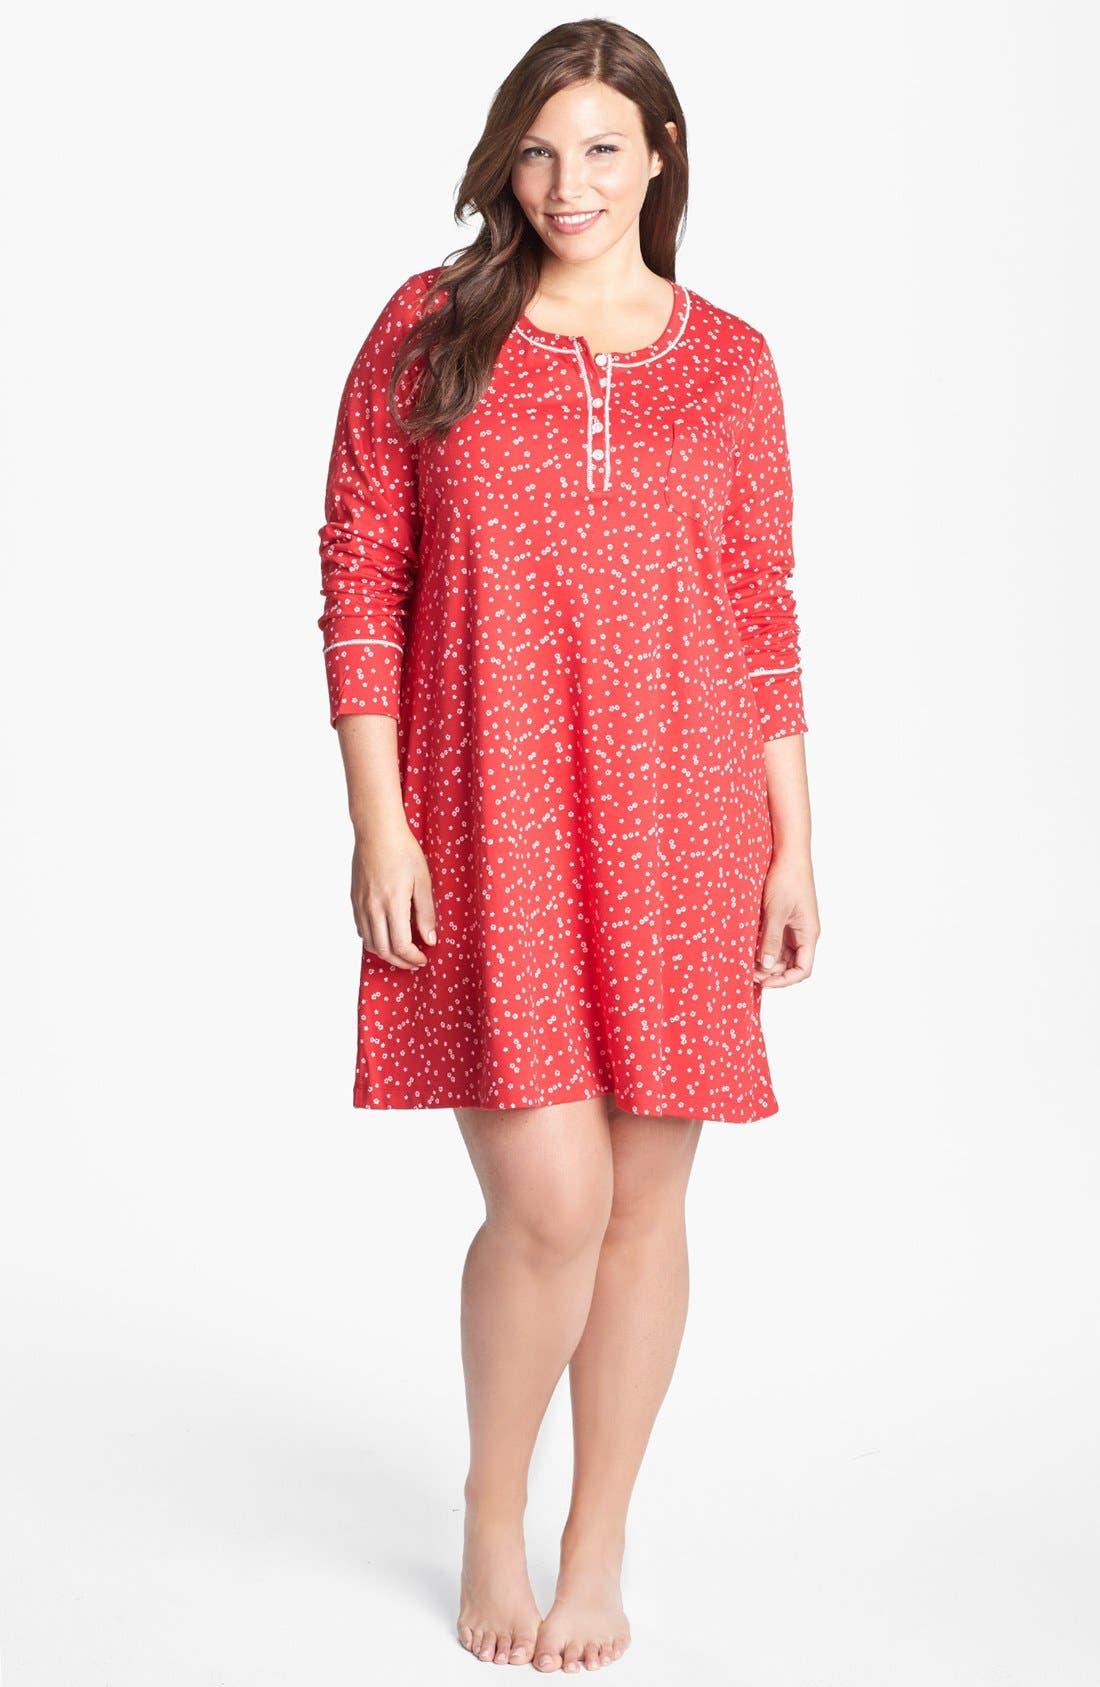 Alternate Image 1 Selected - Carole Hochman Designs Knit Sleep Shirt (Plus Size)